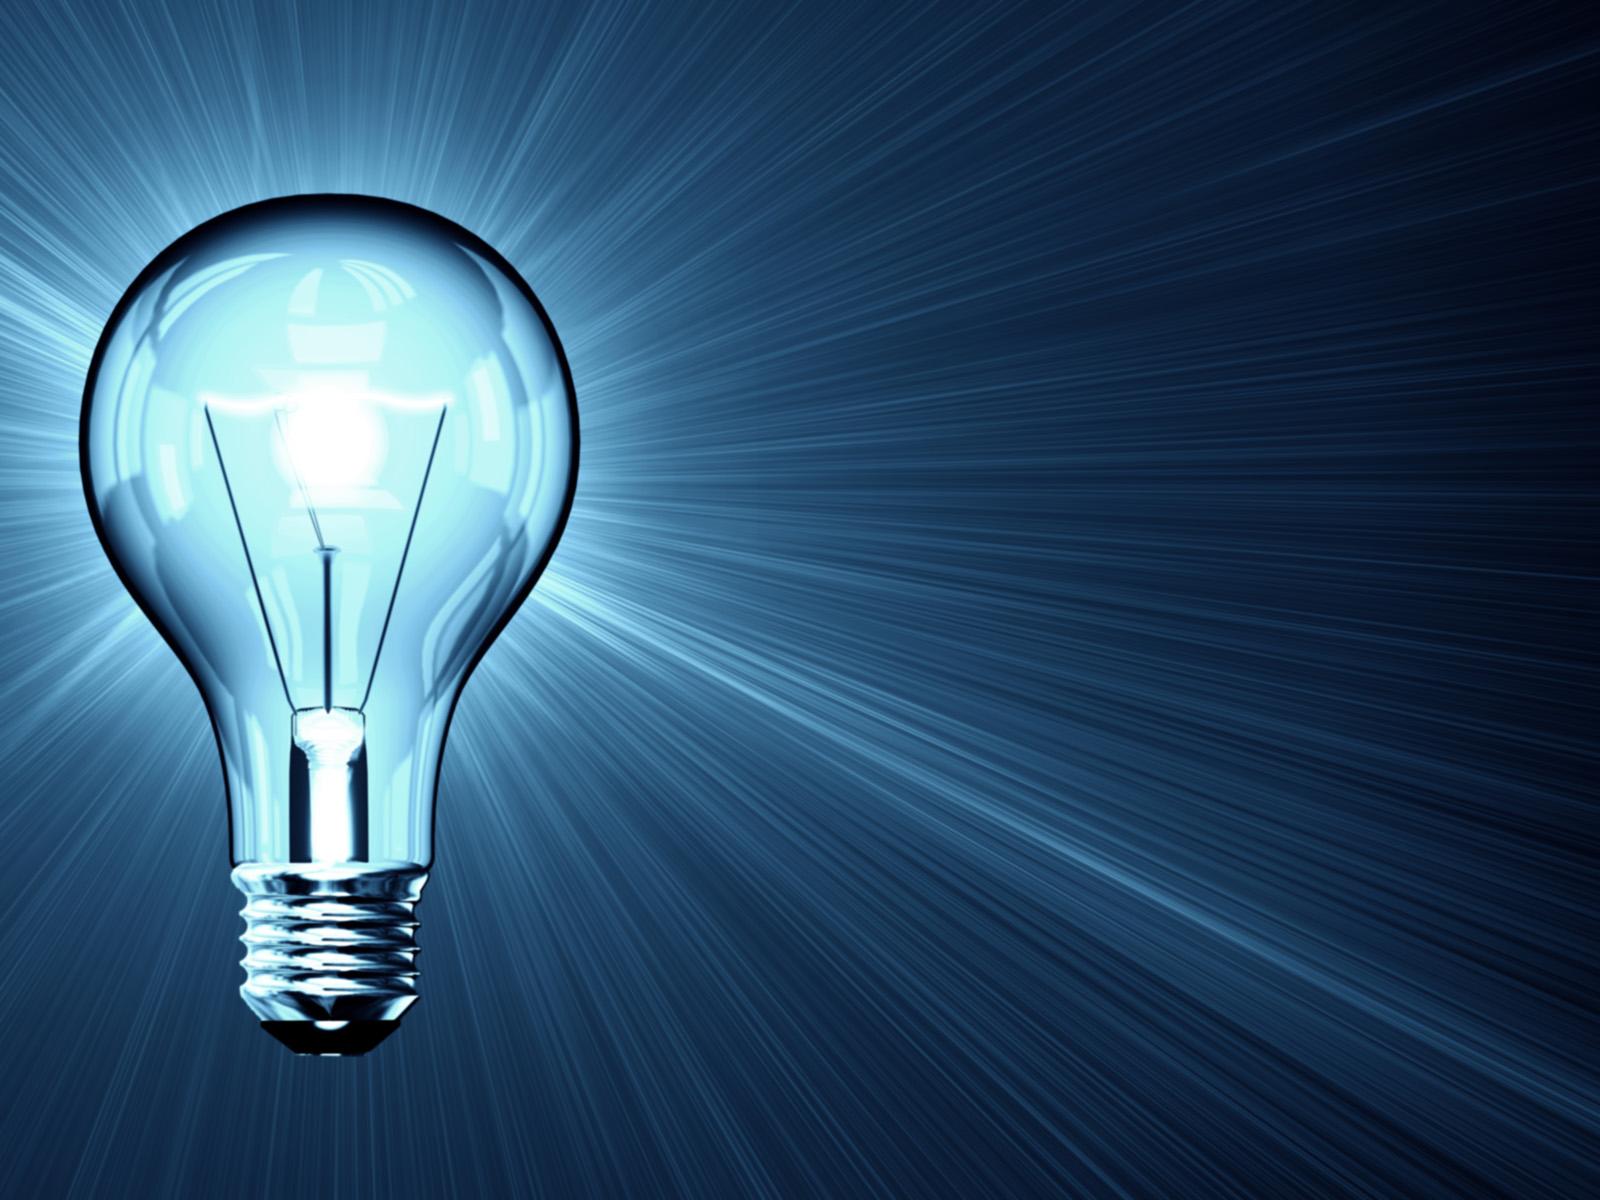 Light Bulb Gods Last Message